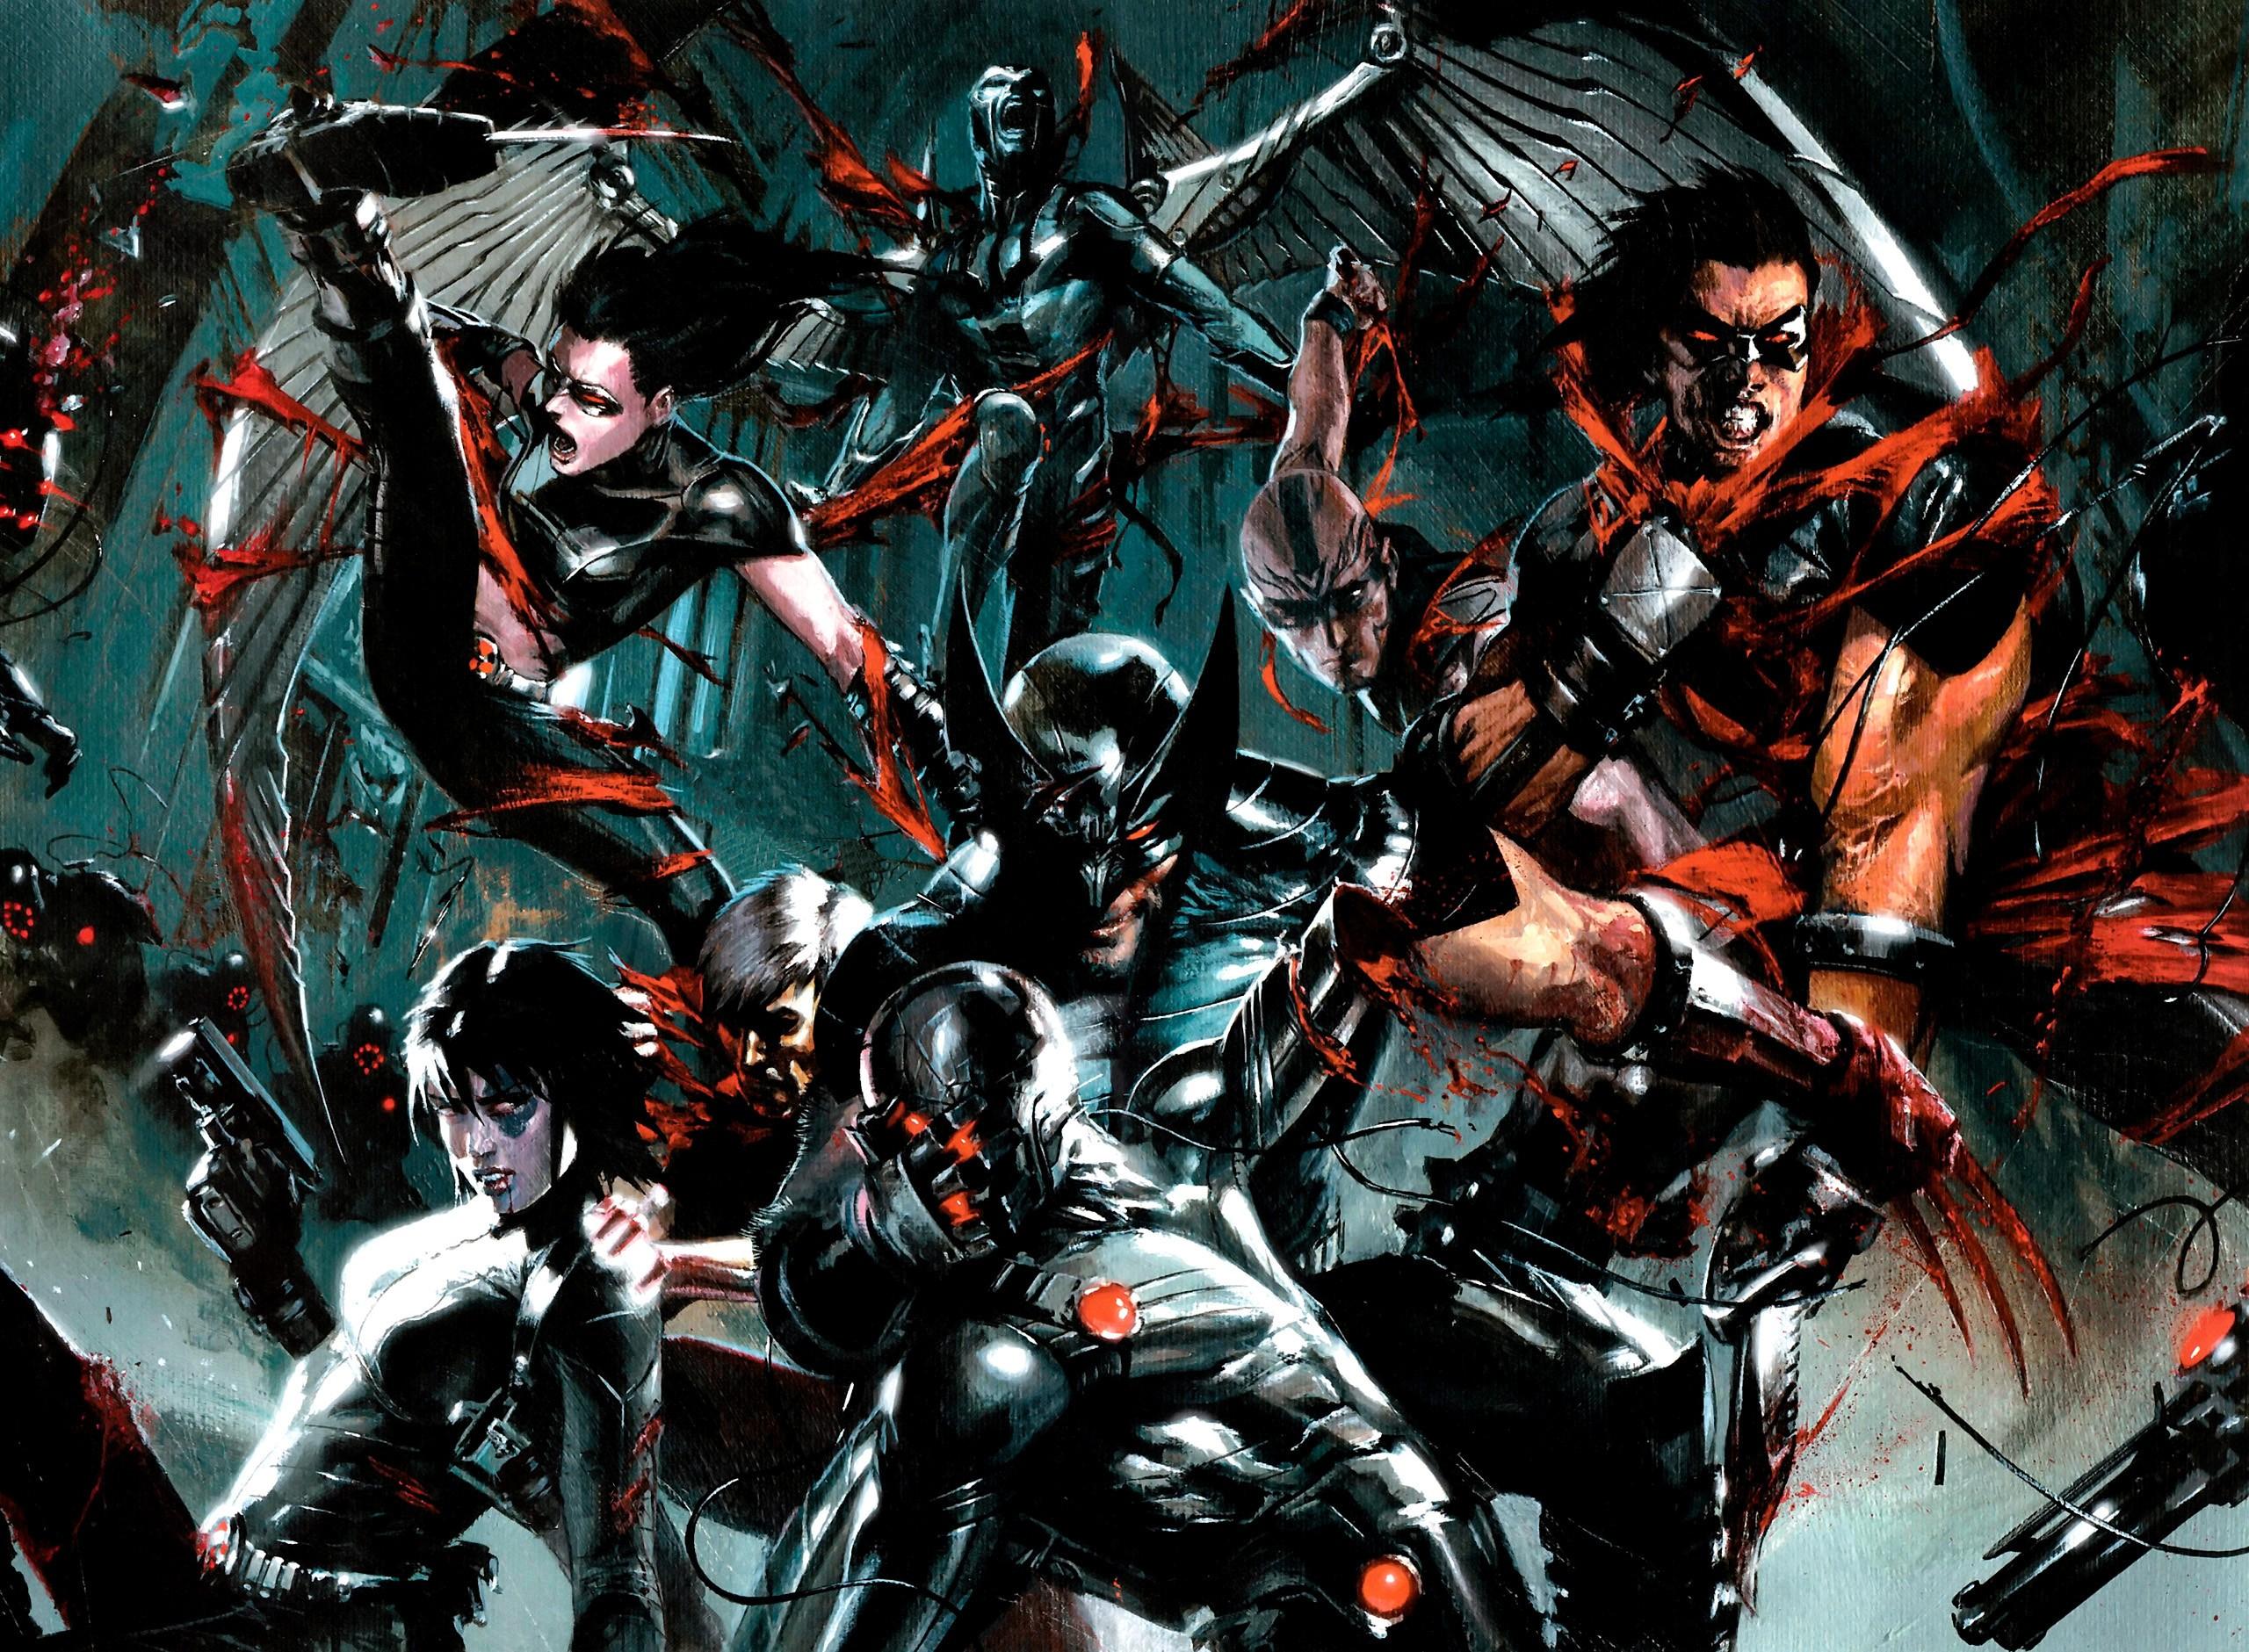 Drew Goddard dirigirá X Force, Cable y Deadpool dirigirán el equipo